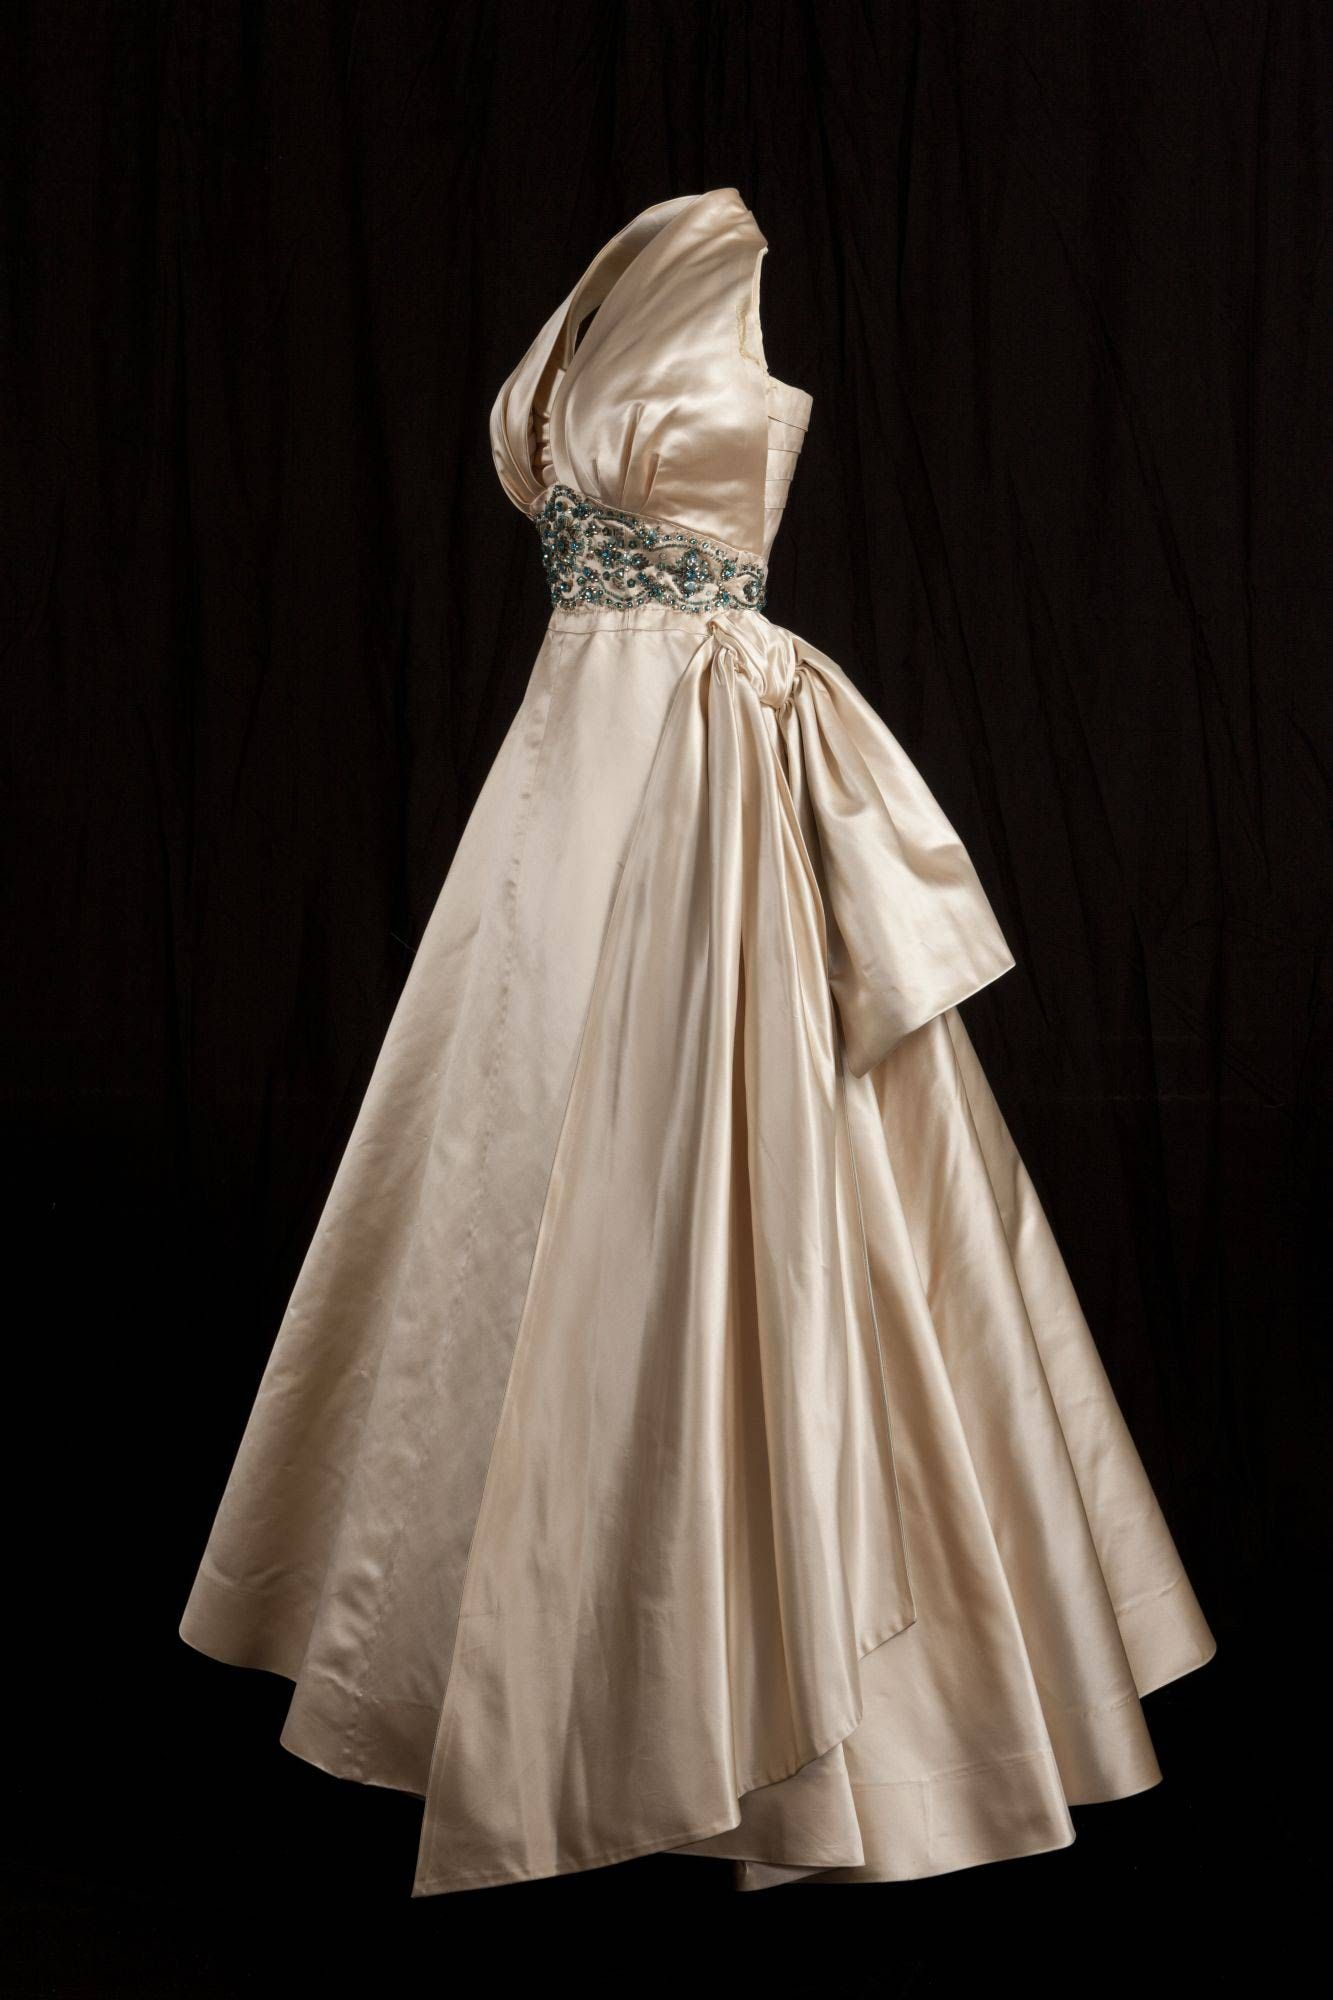 Princess Margaret Satin Gown Fashion Queen Dress Gowns Dresses